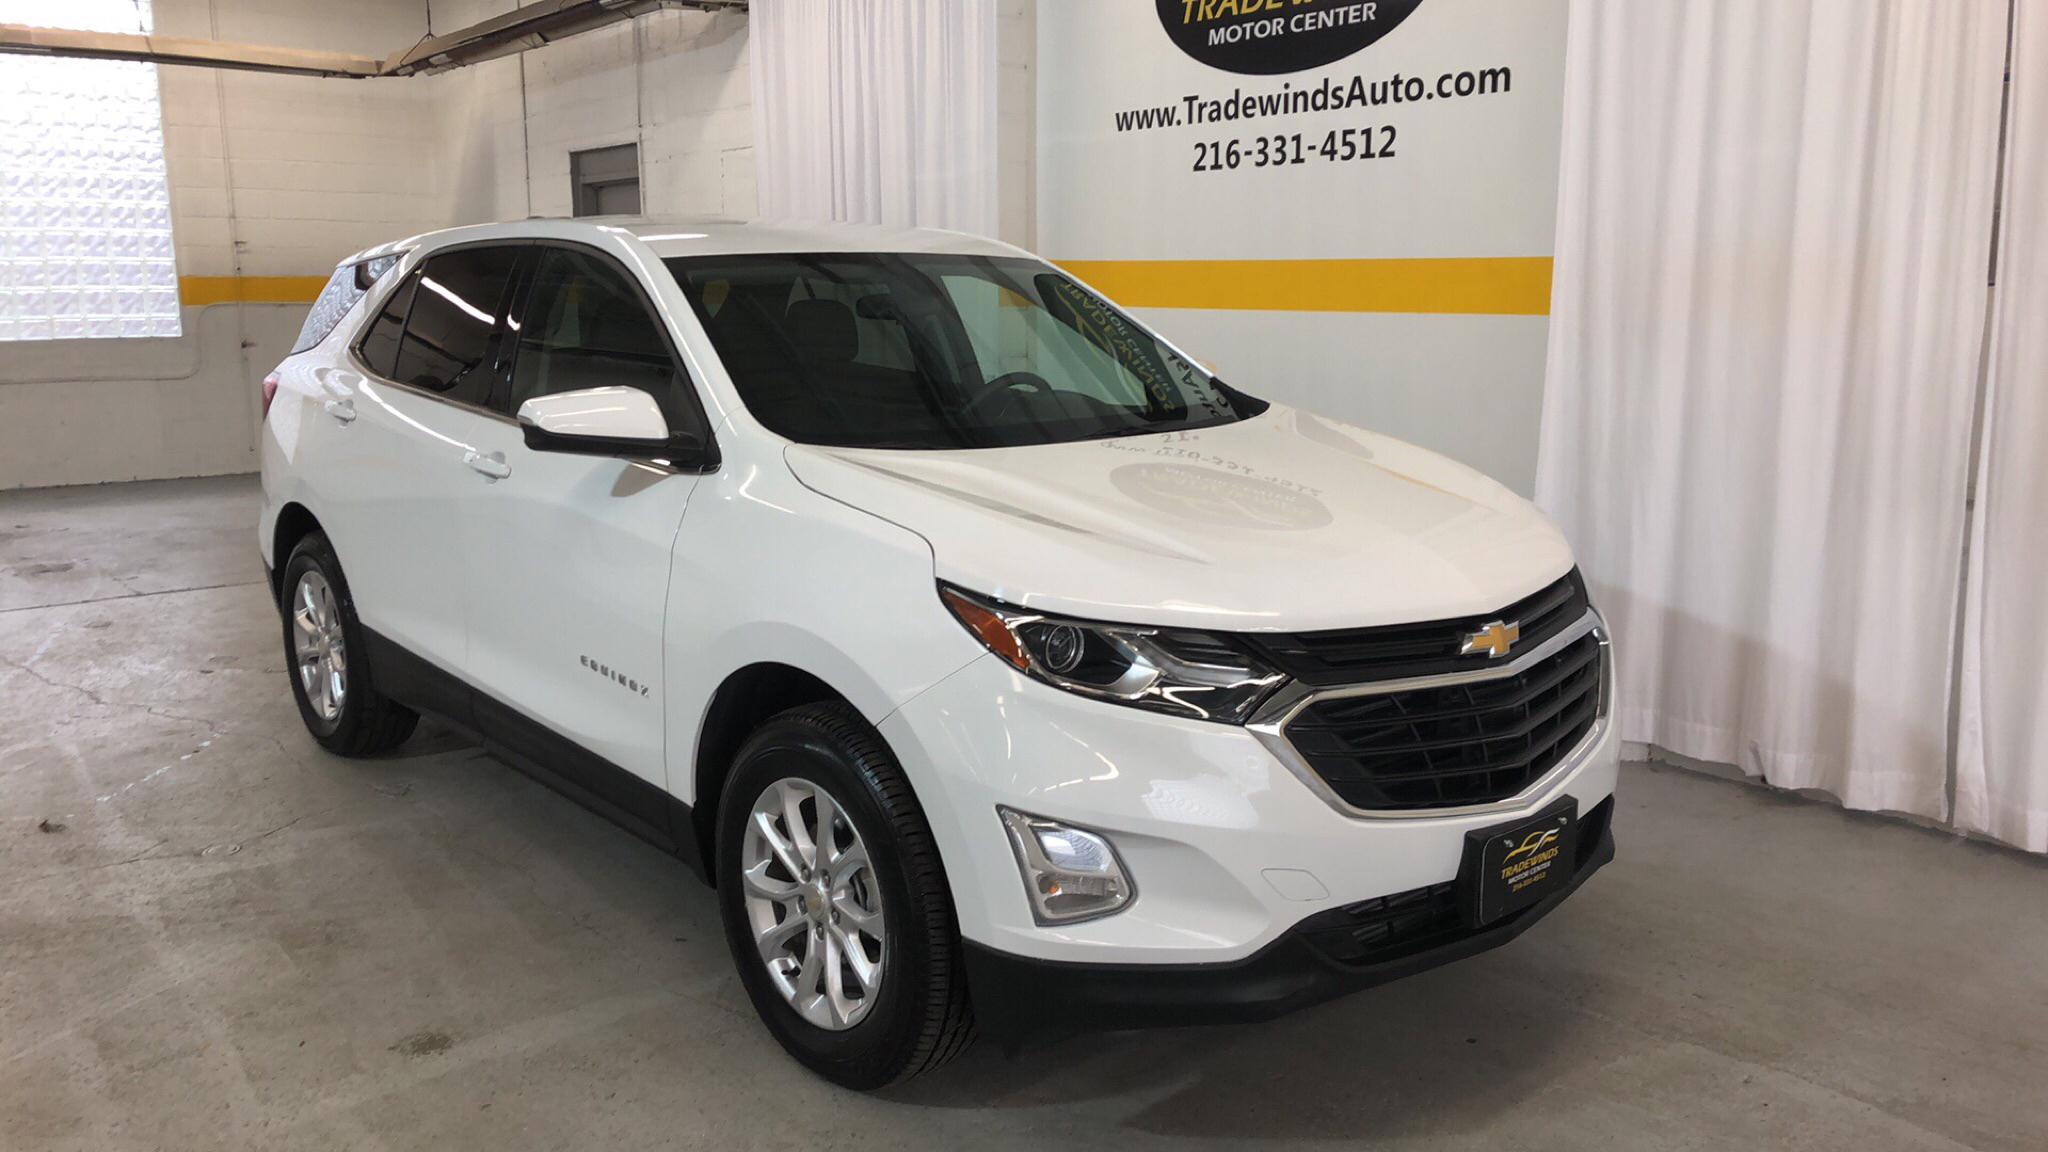 2018 CHEVROLET EQUINOX LT for sale at Tradewinds Motor Center